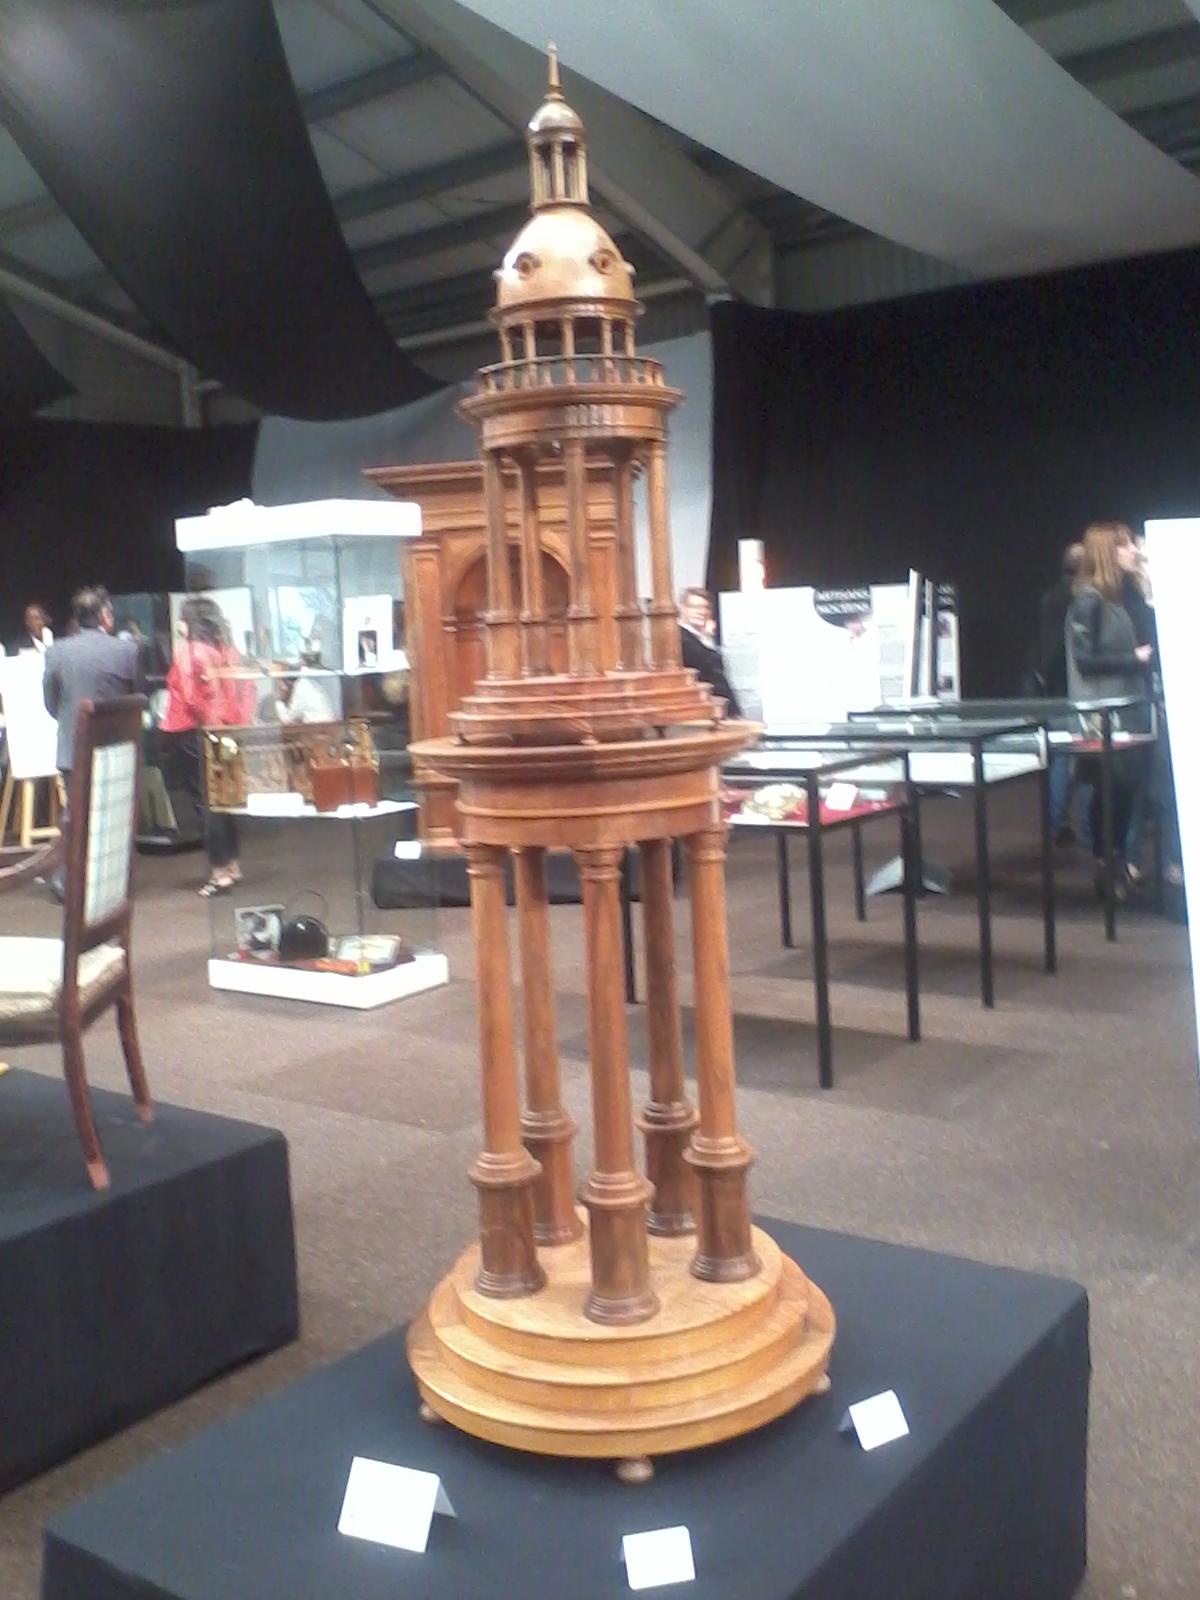 Mars 2012 paris blogged for Salon de l artisanat valence